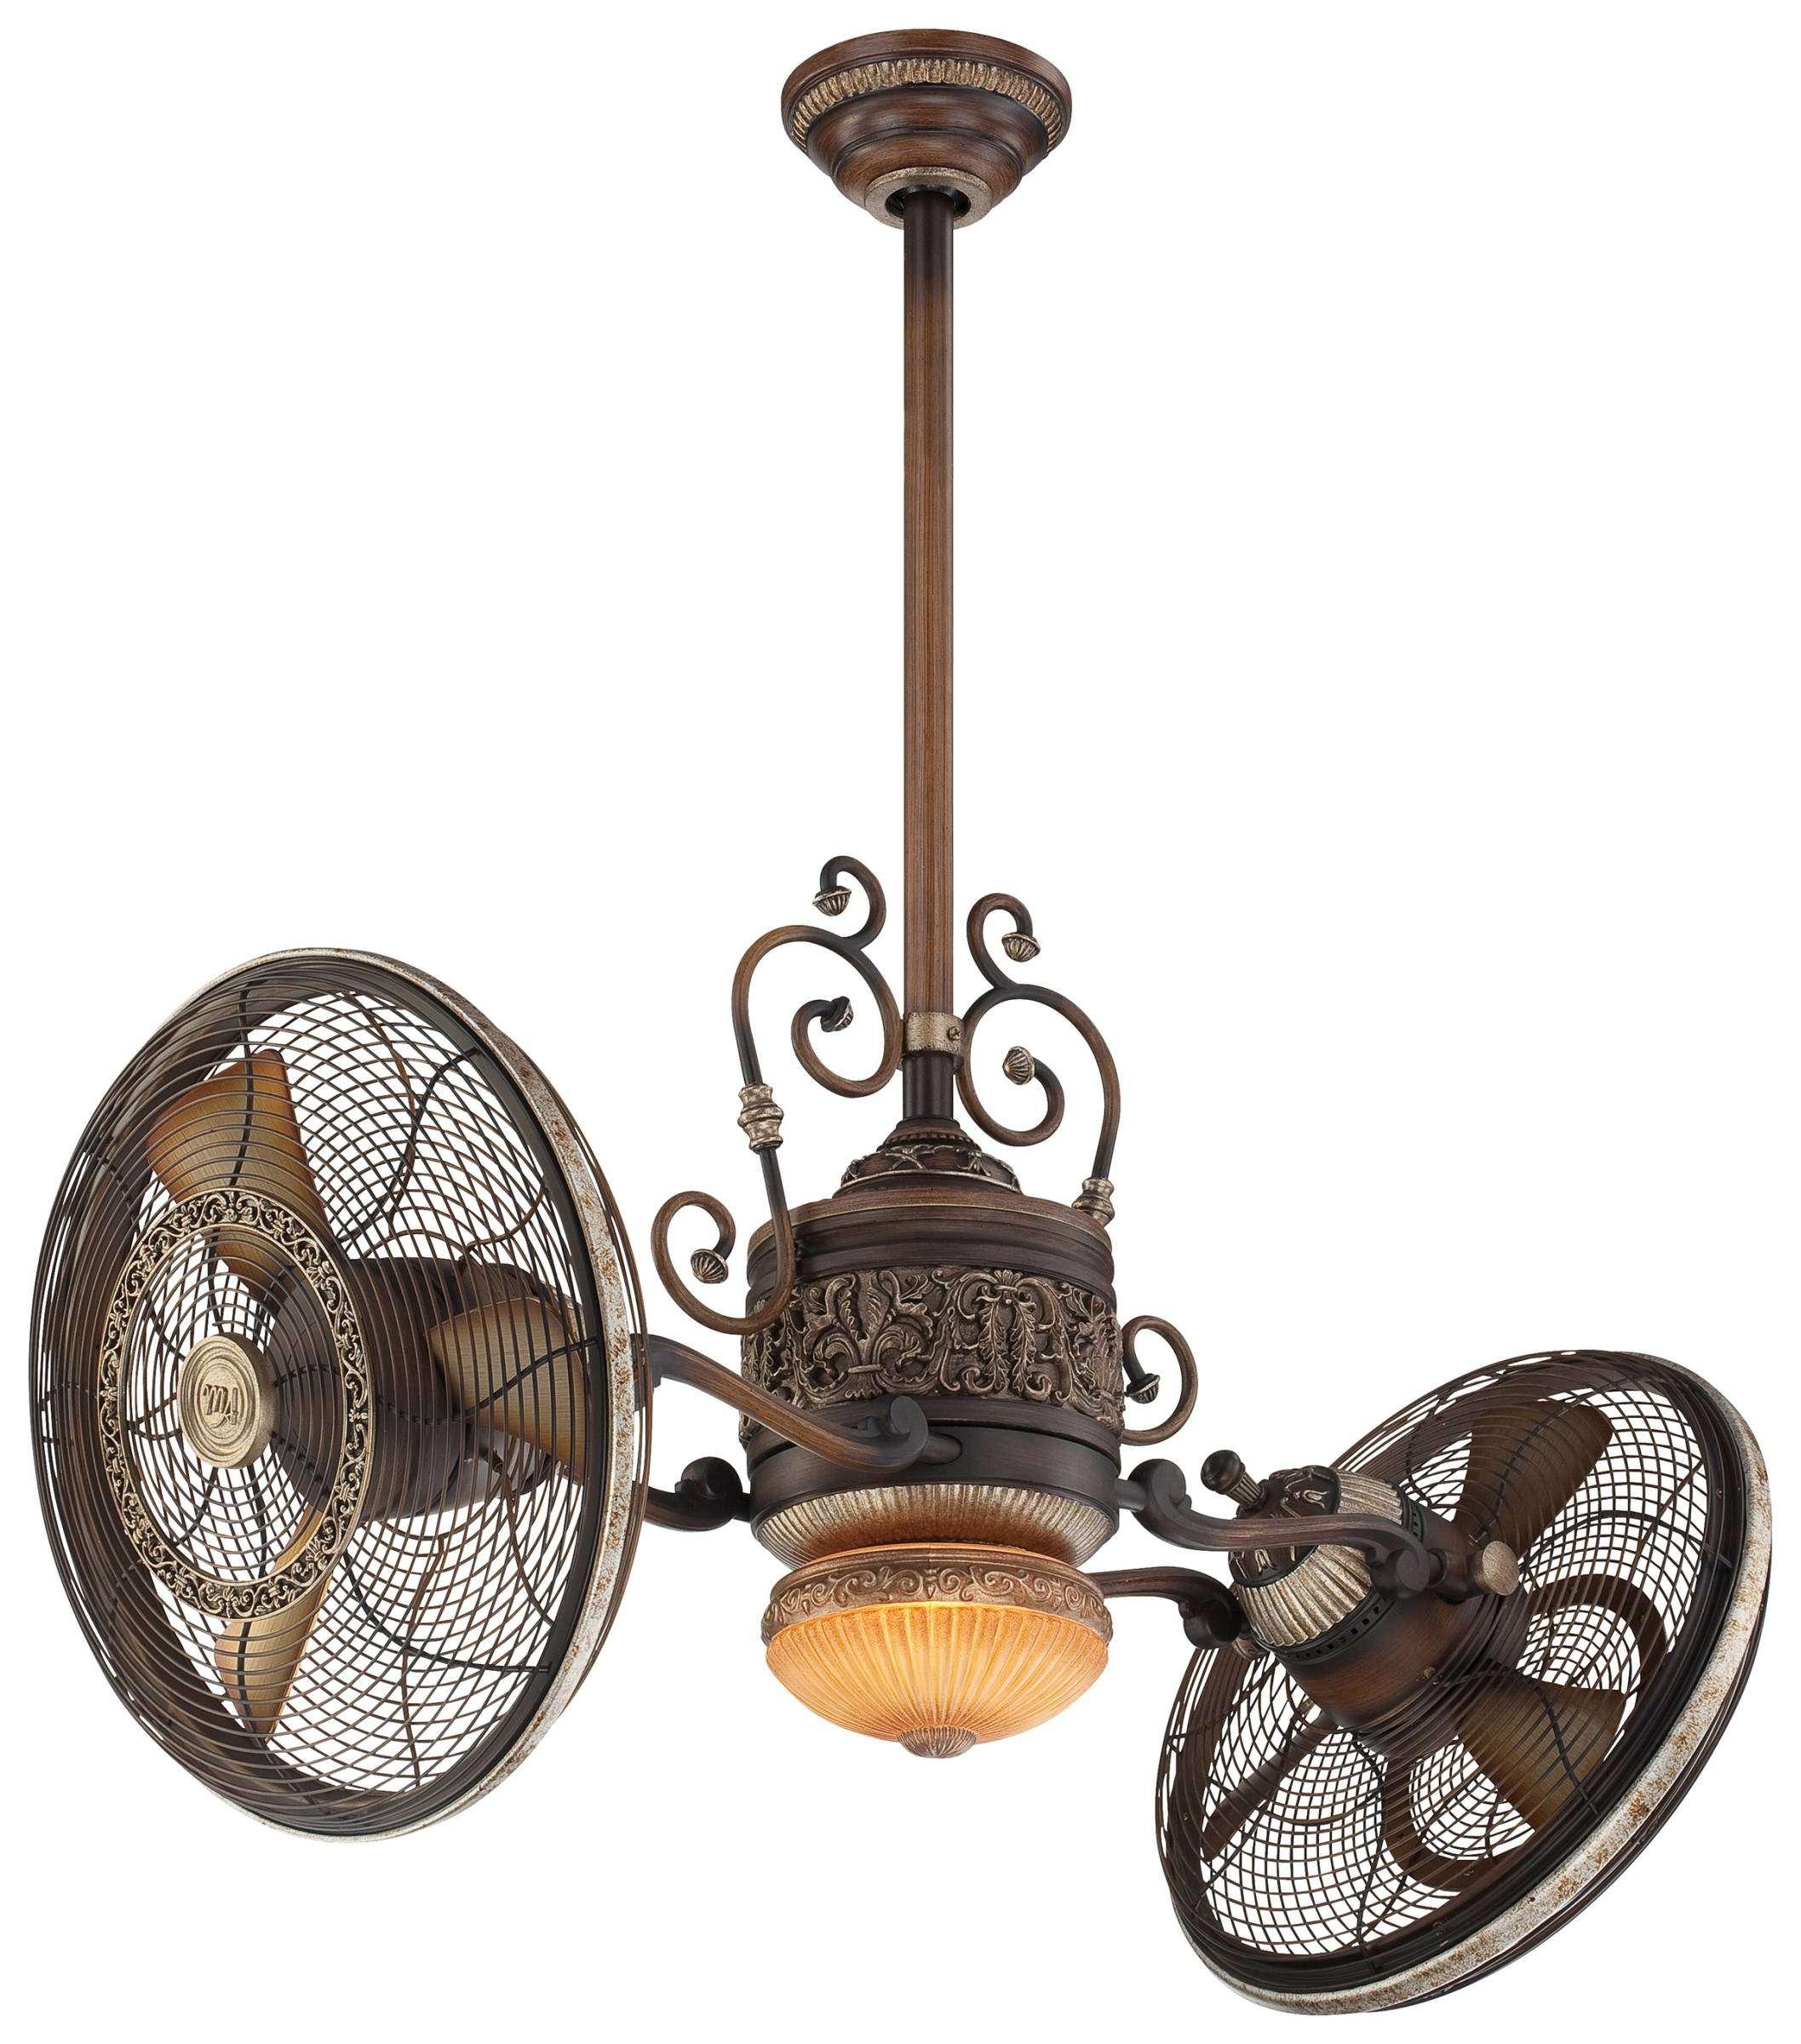 Minka Aire Gyro Traditional LED Ceiling Fan Model F502L-BCW in Belcaro Walnut